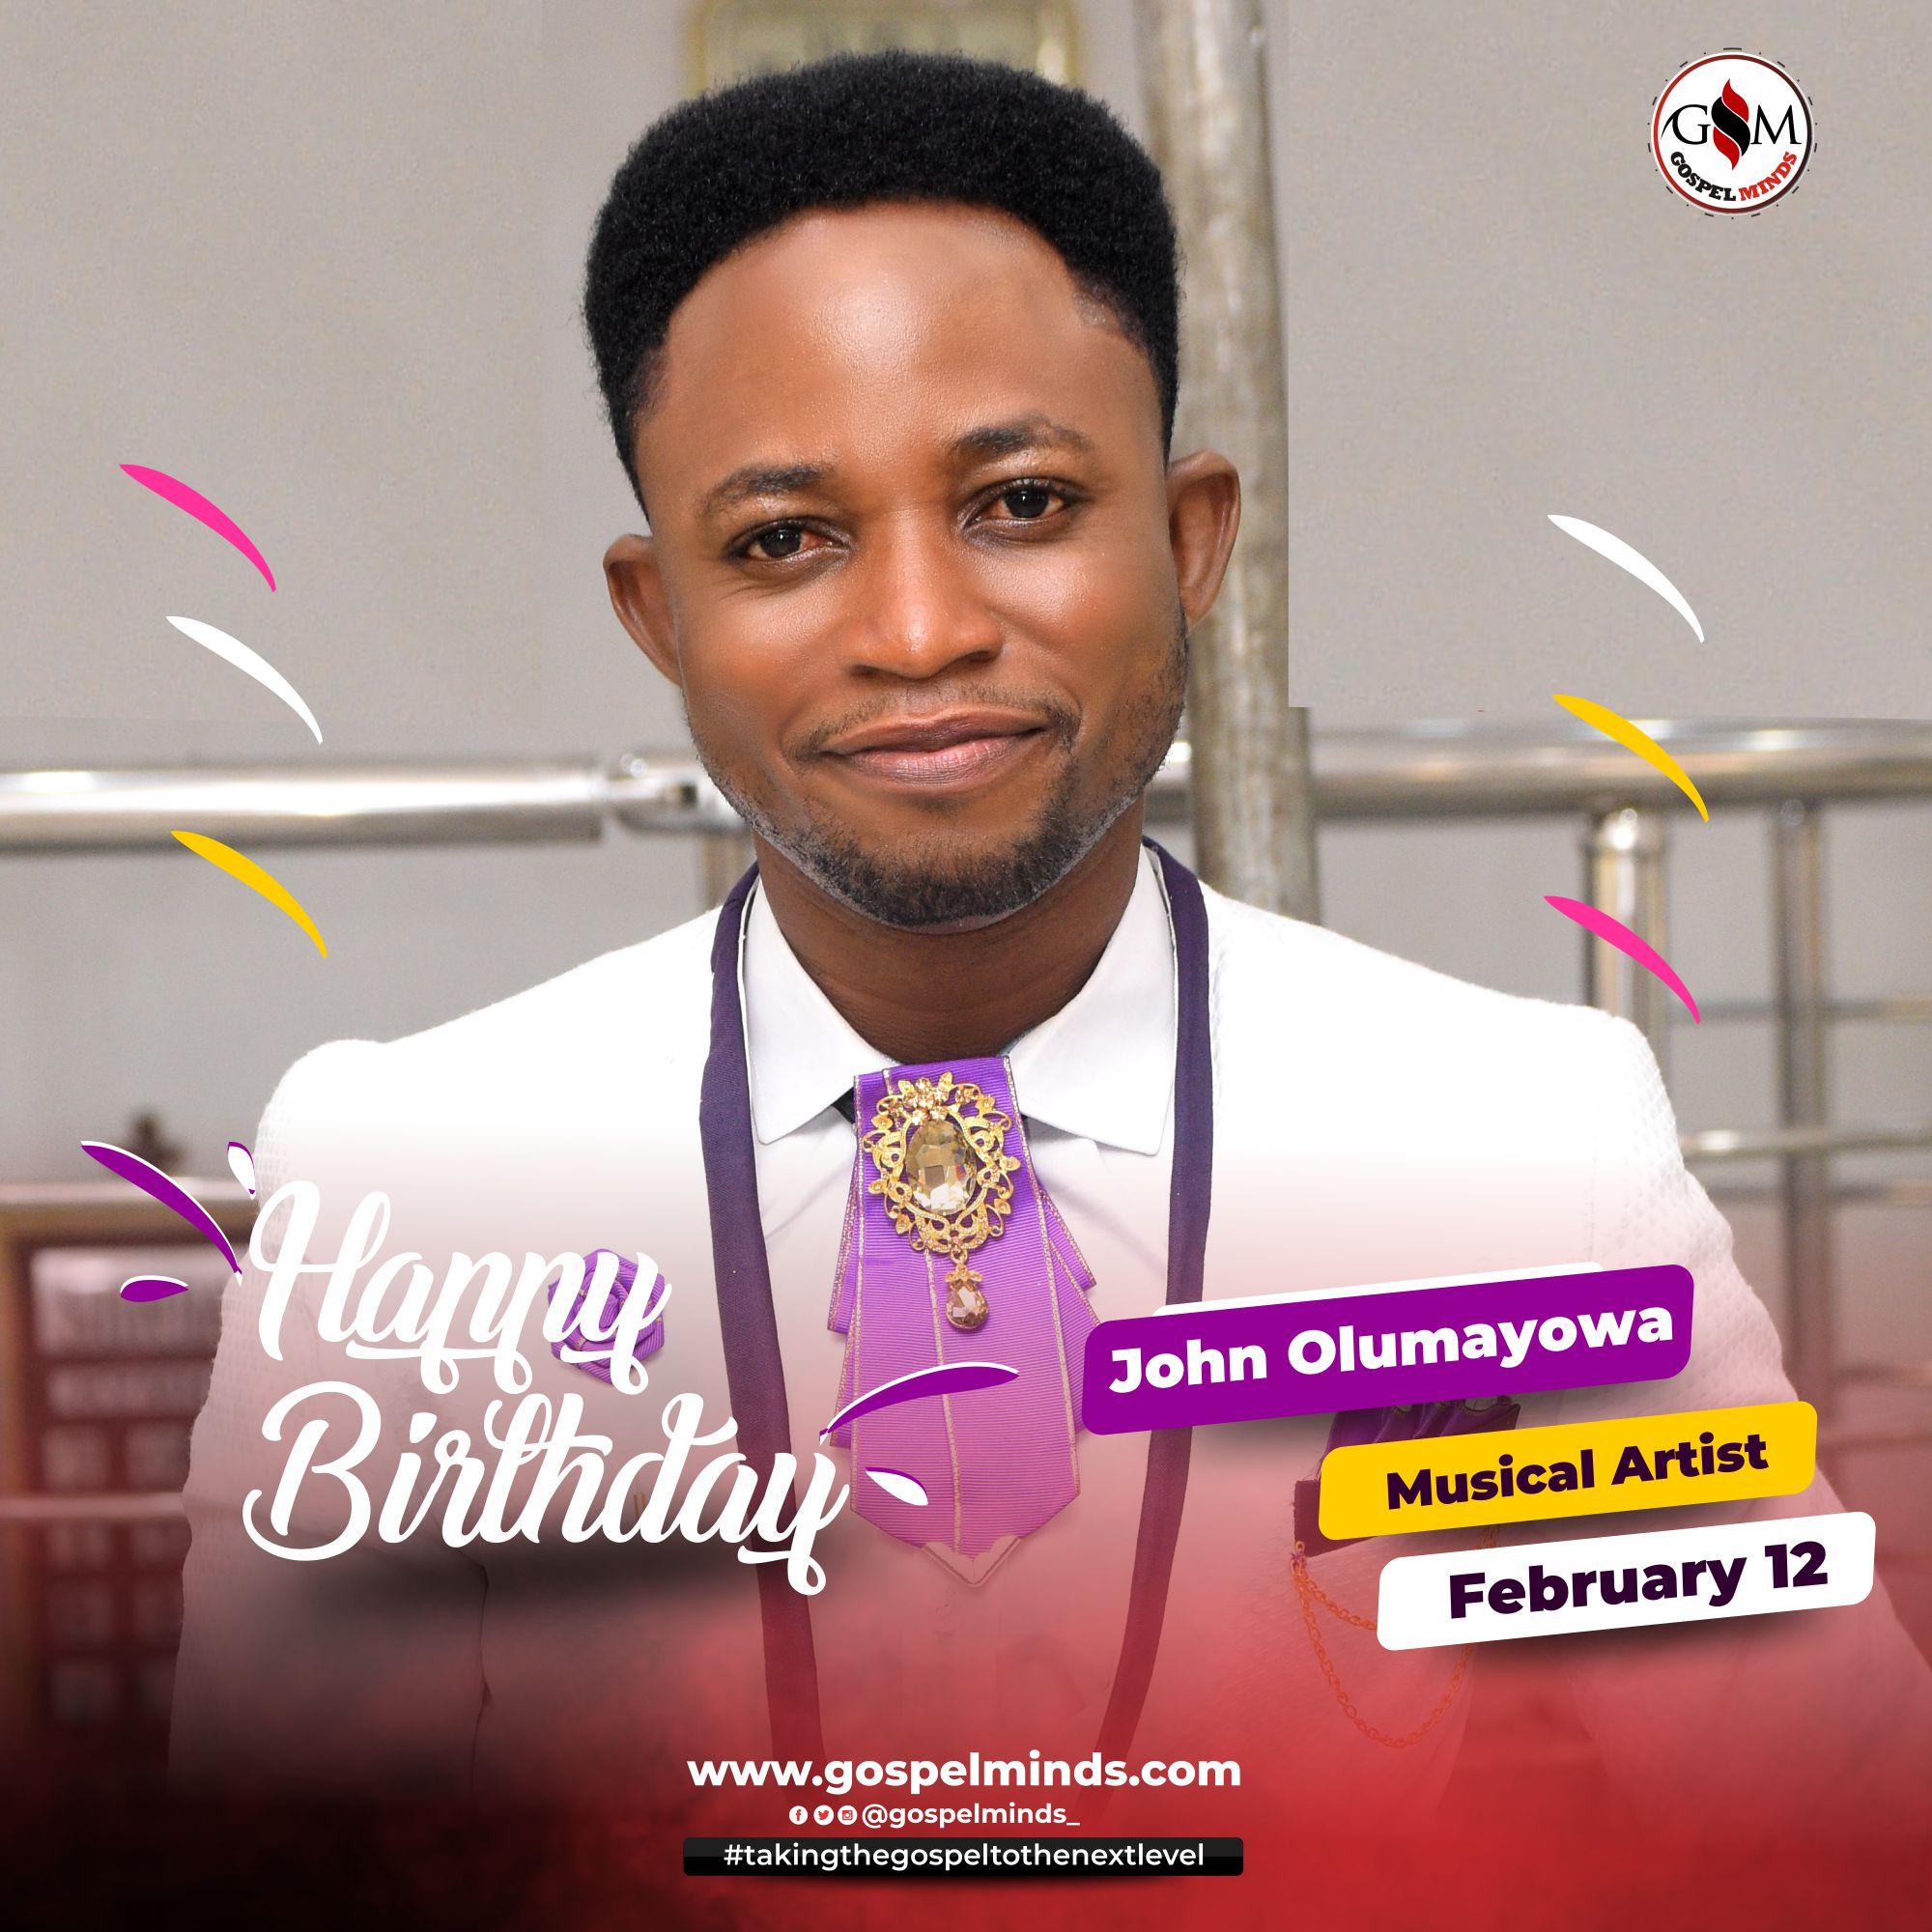 Happy Birthday To John Olumayowa